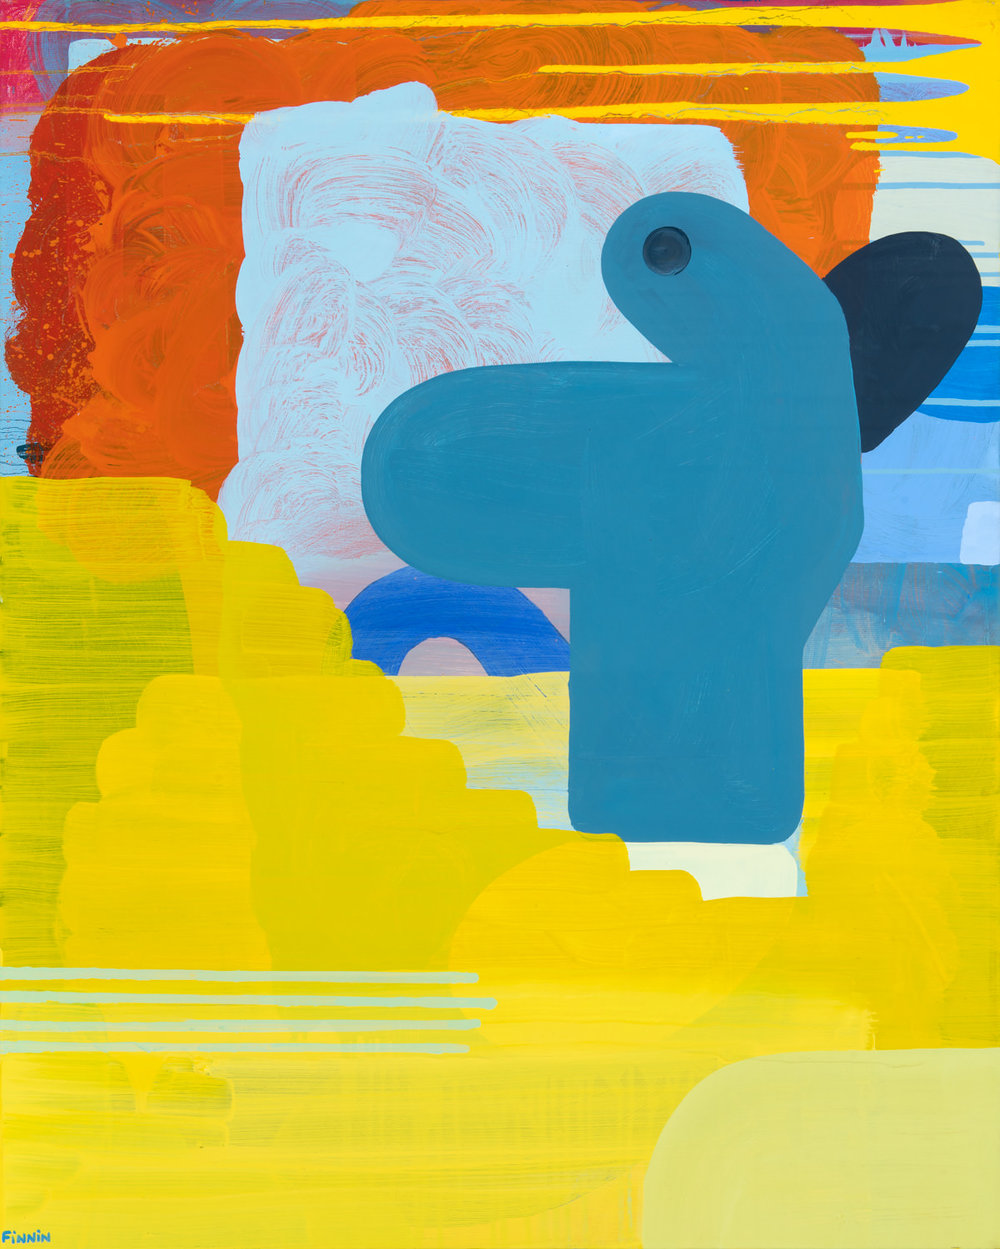 As Soon As I Walk Away I oil on canvas painting I Martin Finnin Abstract Art London